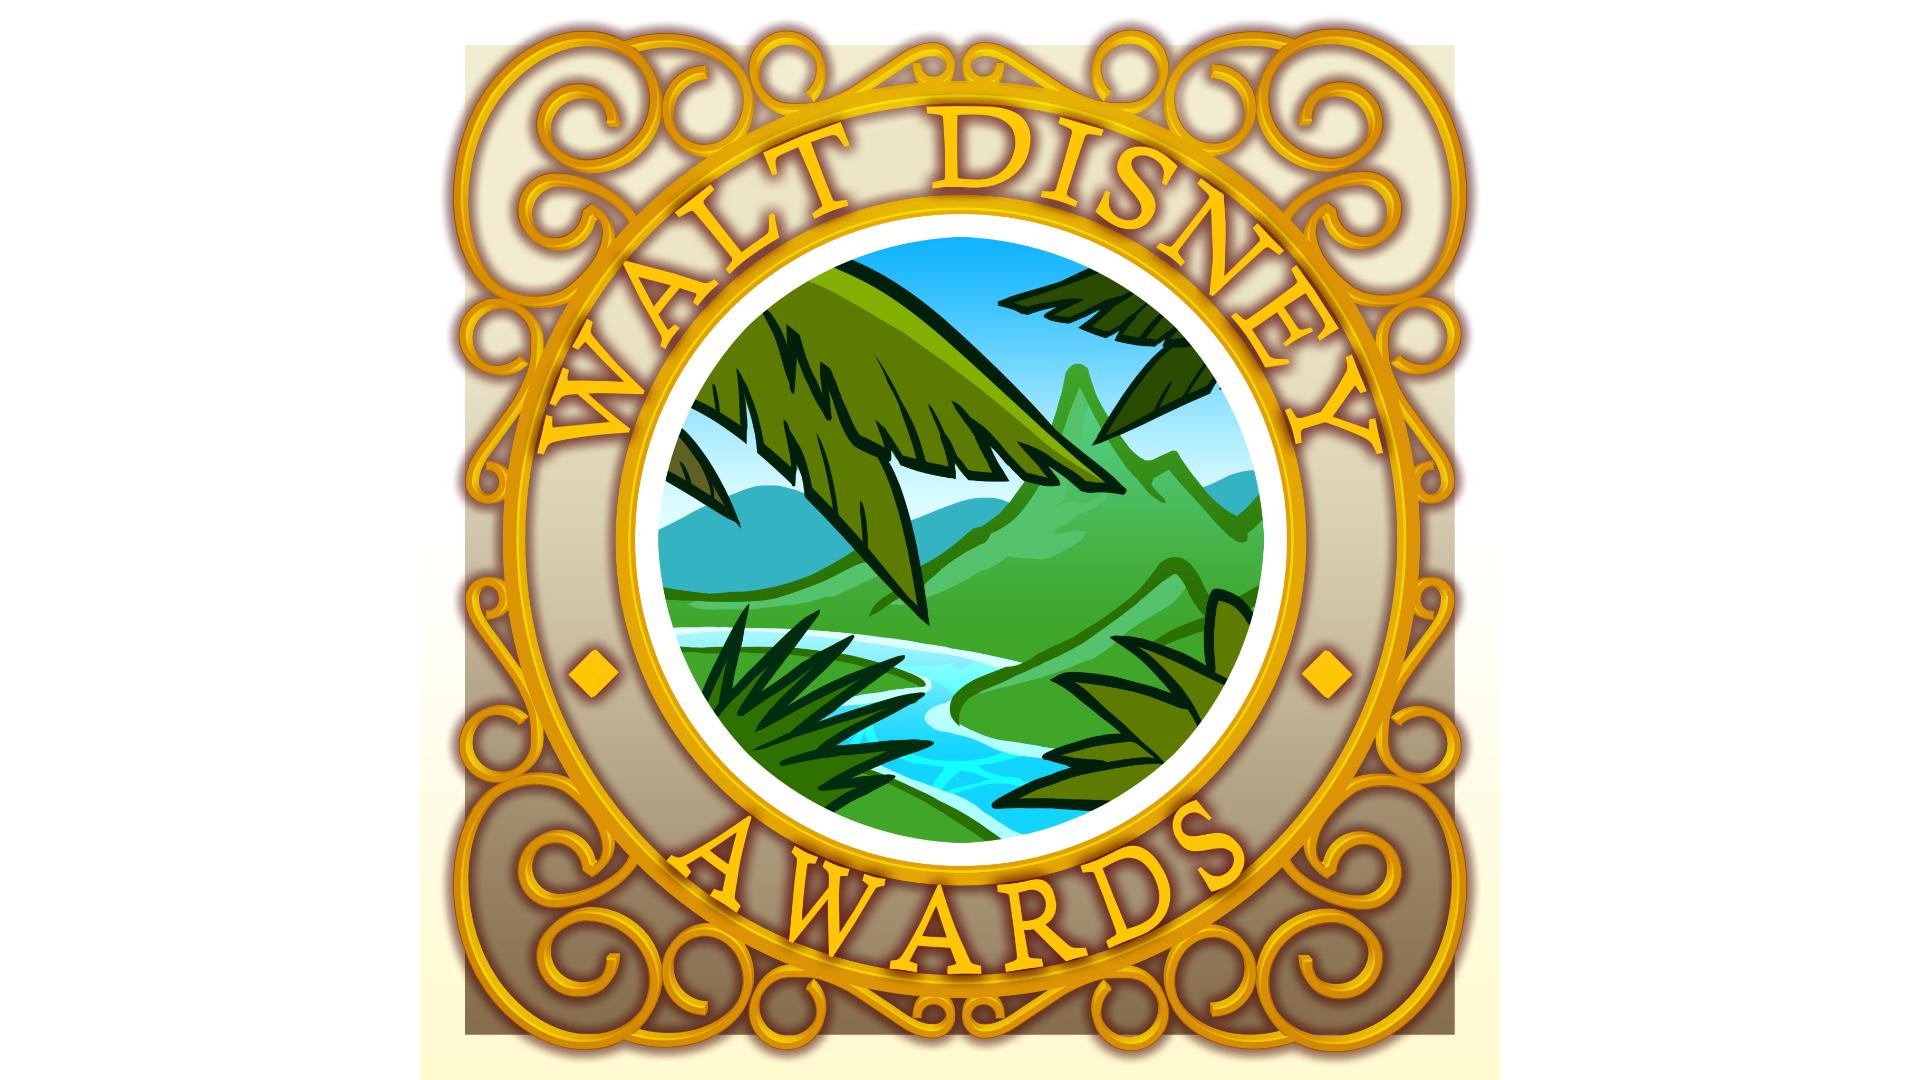 Adventureland Explorer